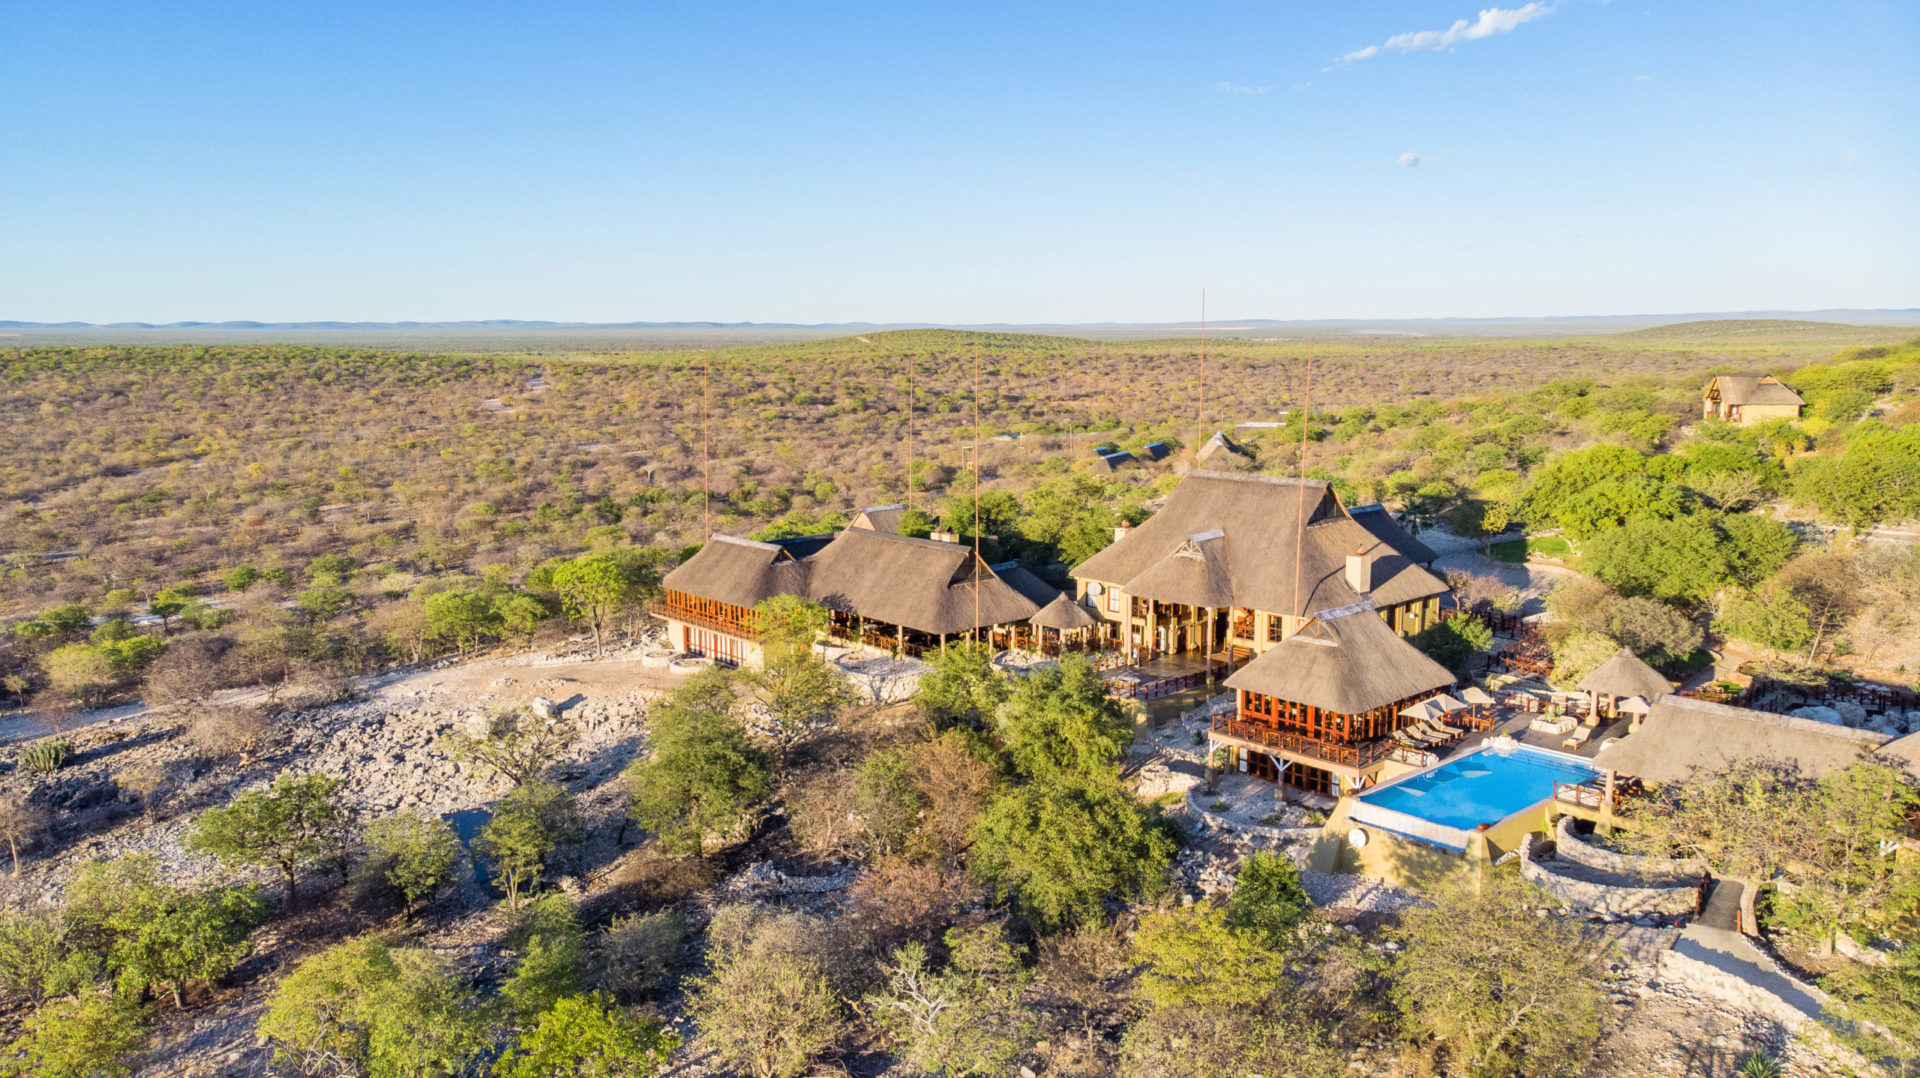 Namibia - 1552 - Epacha Game Lodge - Aerial